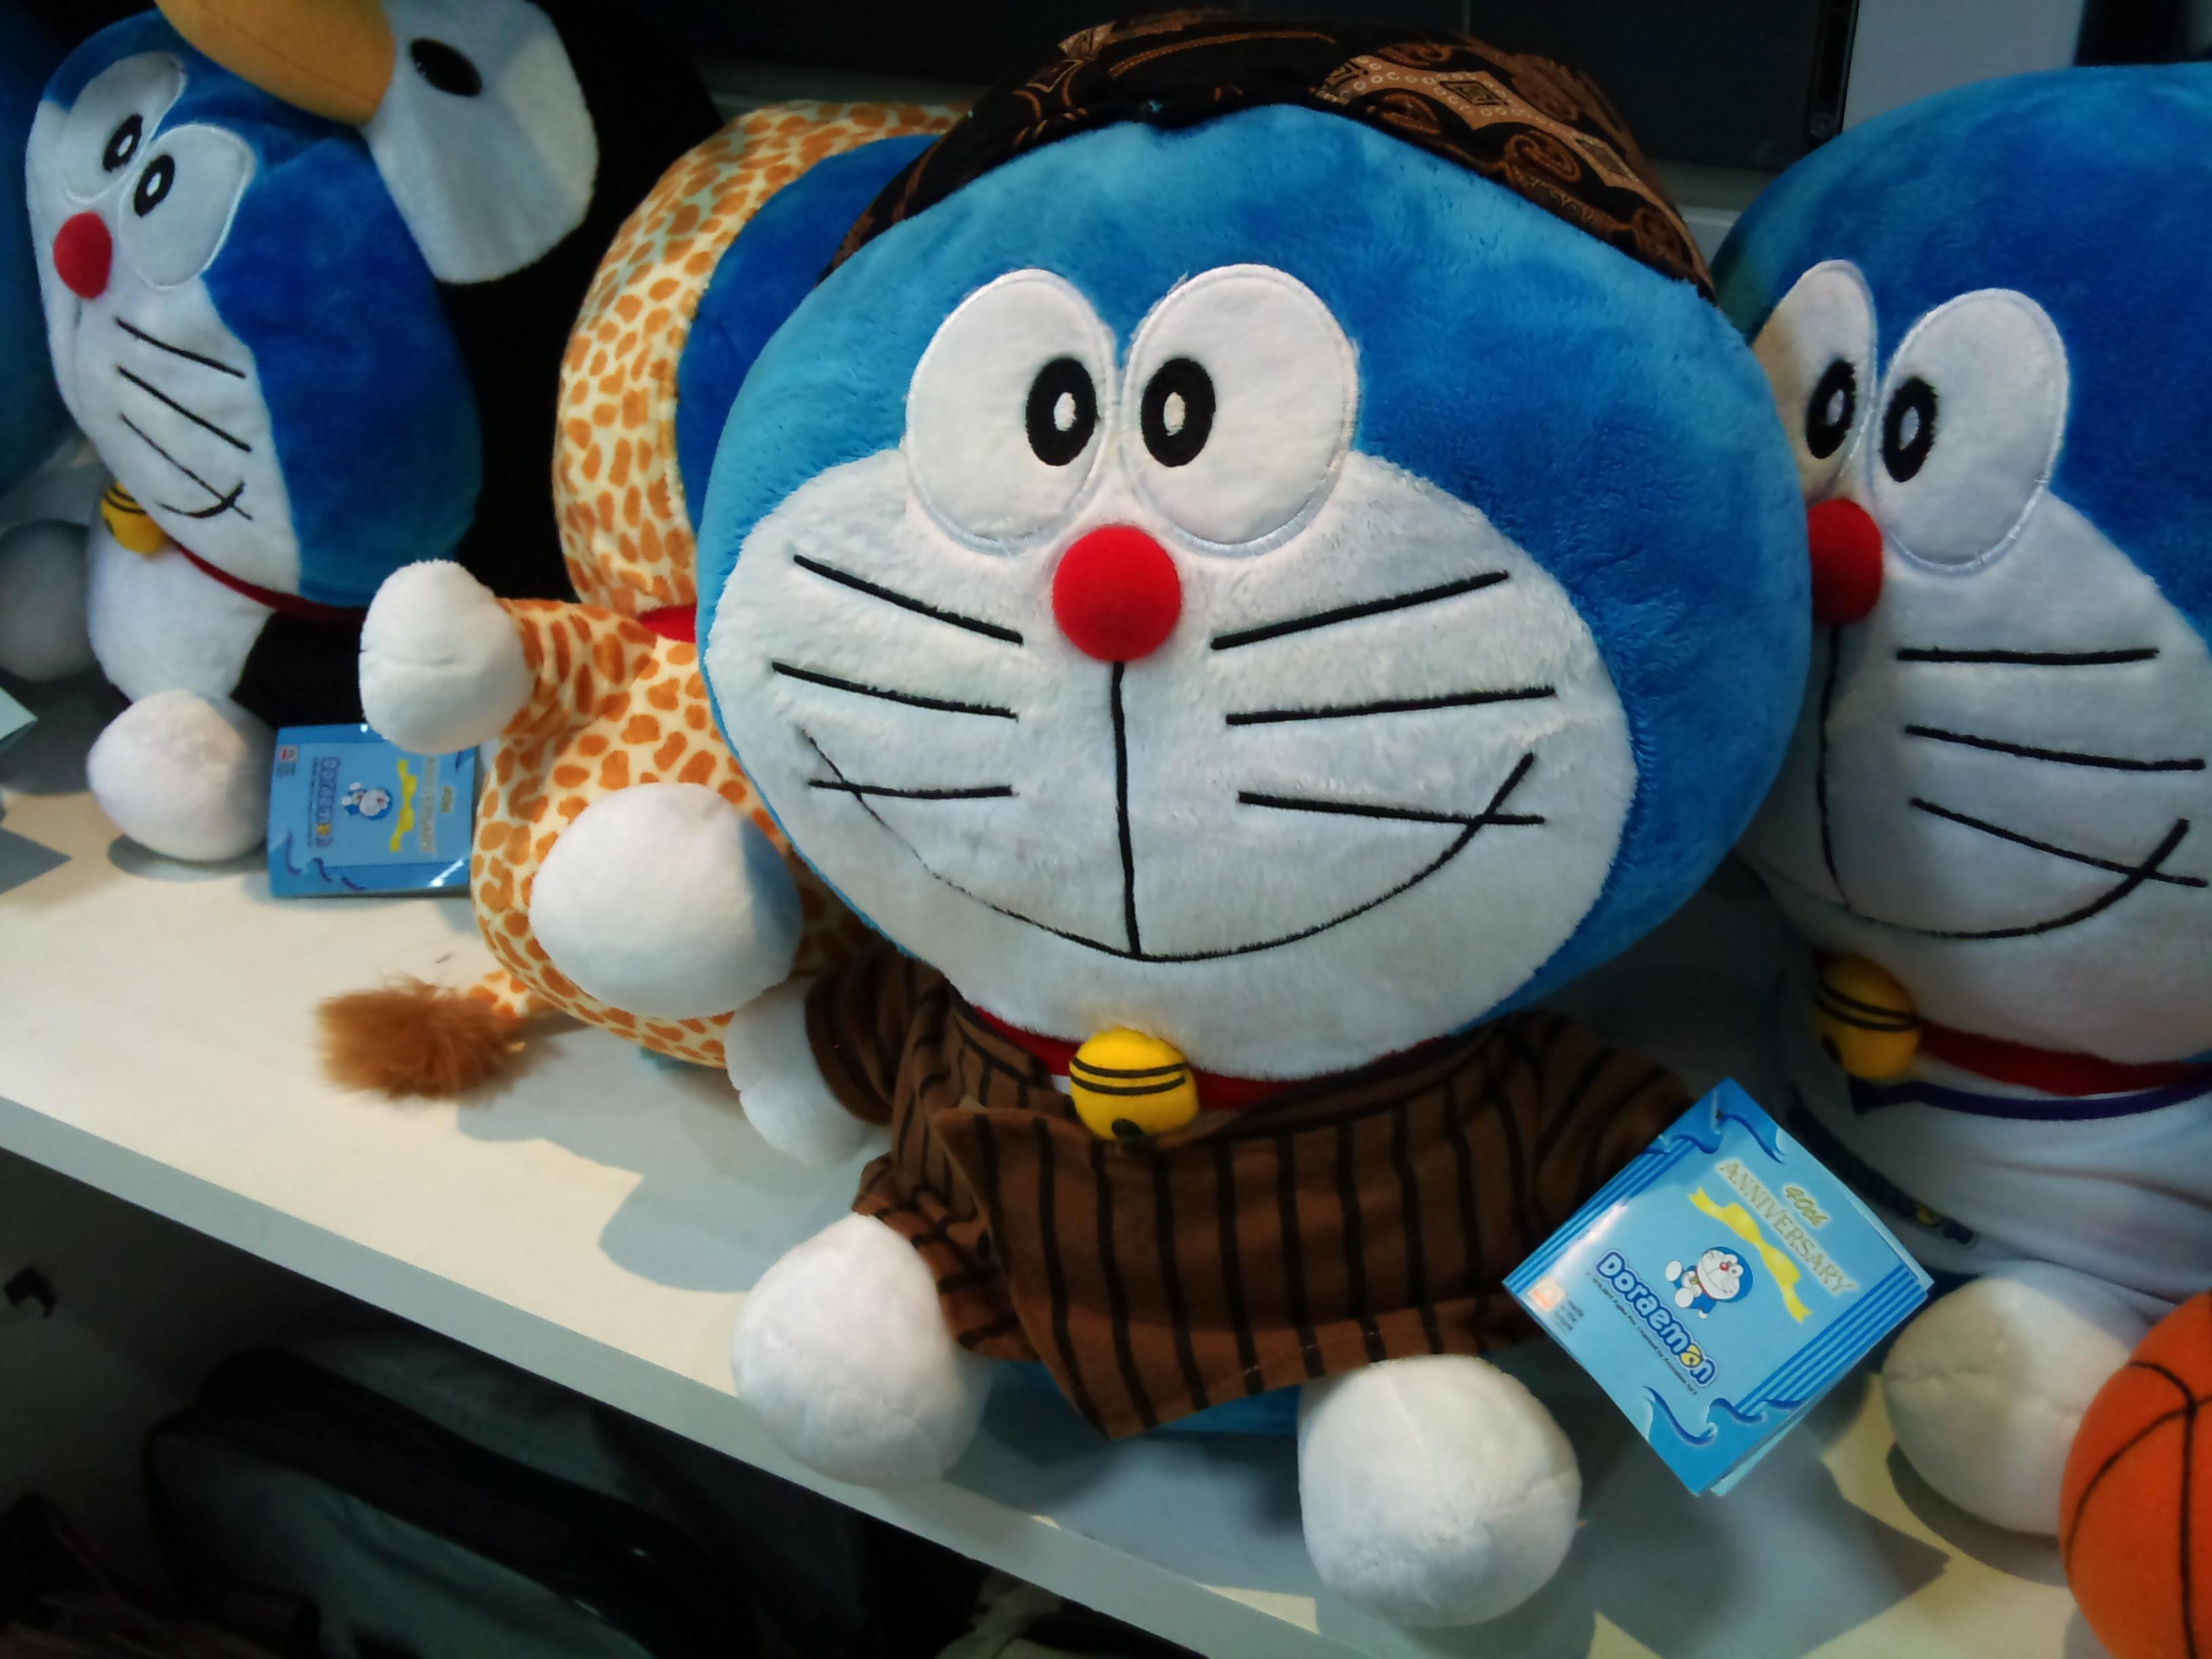 Foto Lucu Boneka Doraemon Terbaru Display Picture Unik